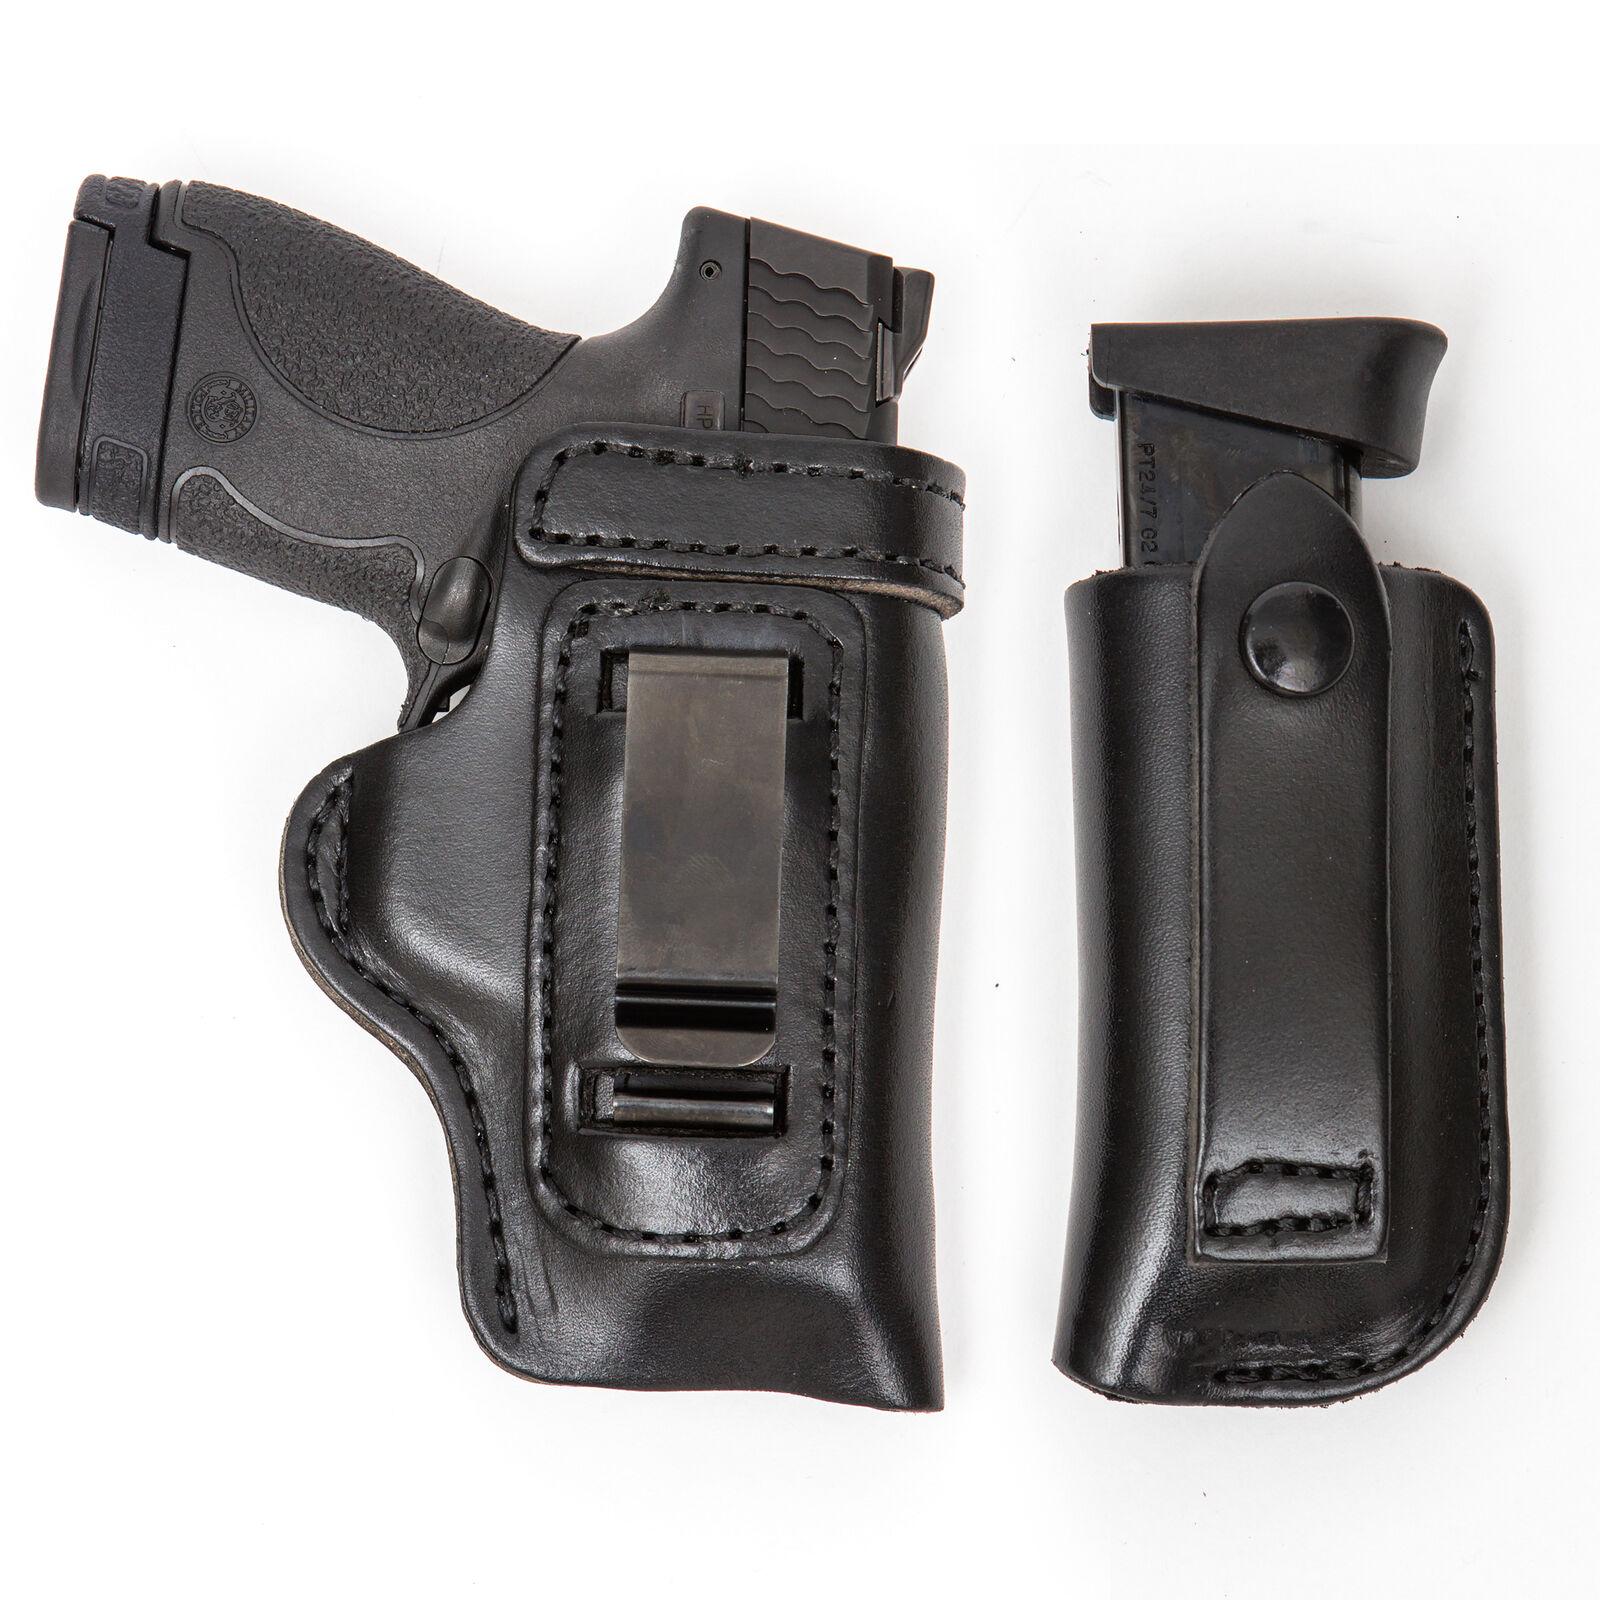 Combo Pack IWB owb RH LH Funda Pistola & Mag Para KEL Tec P11